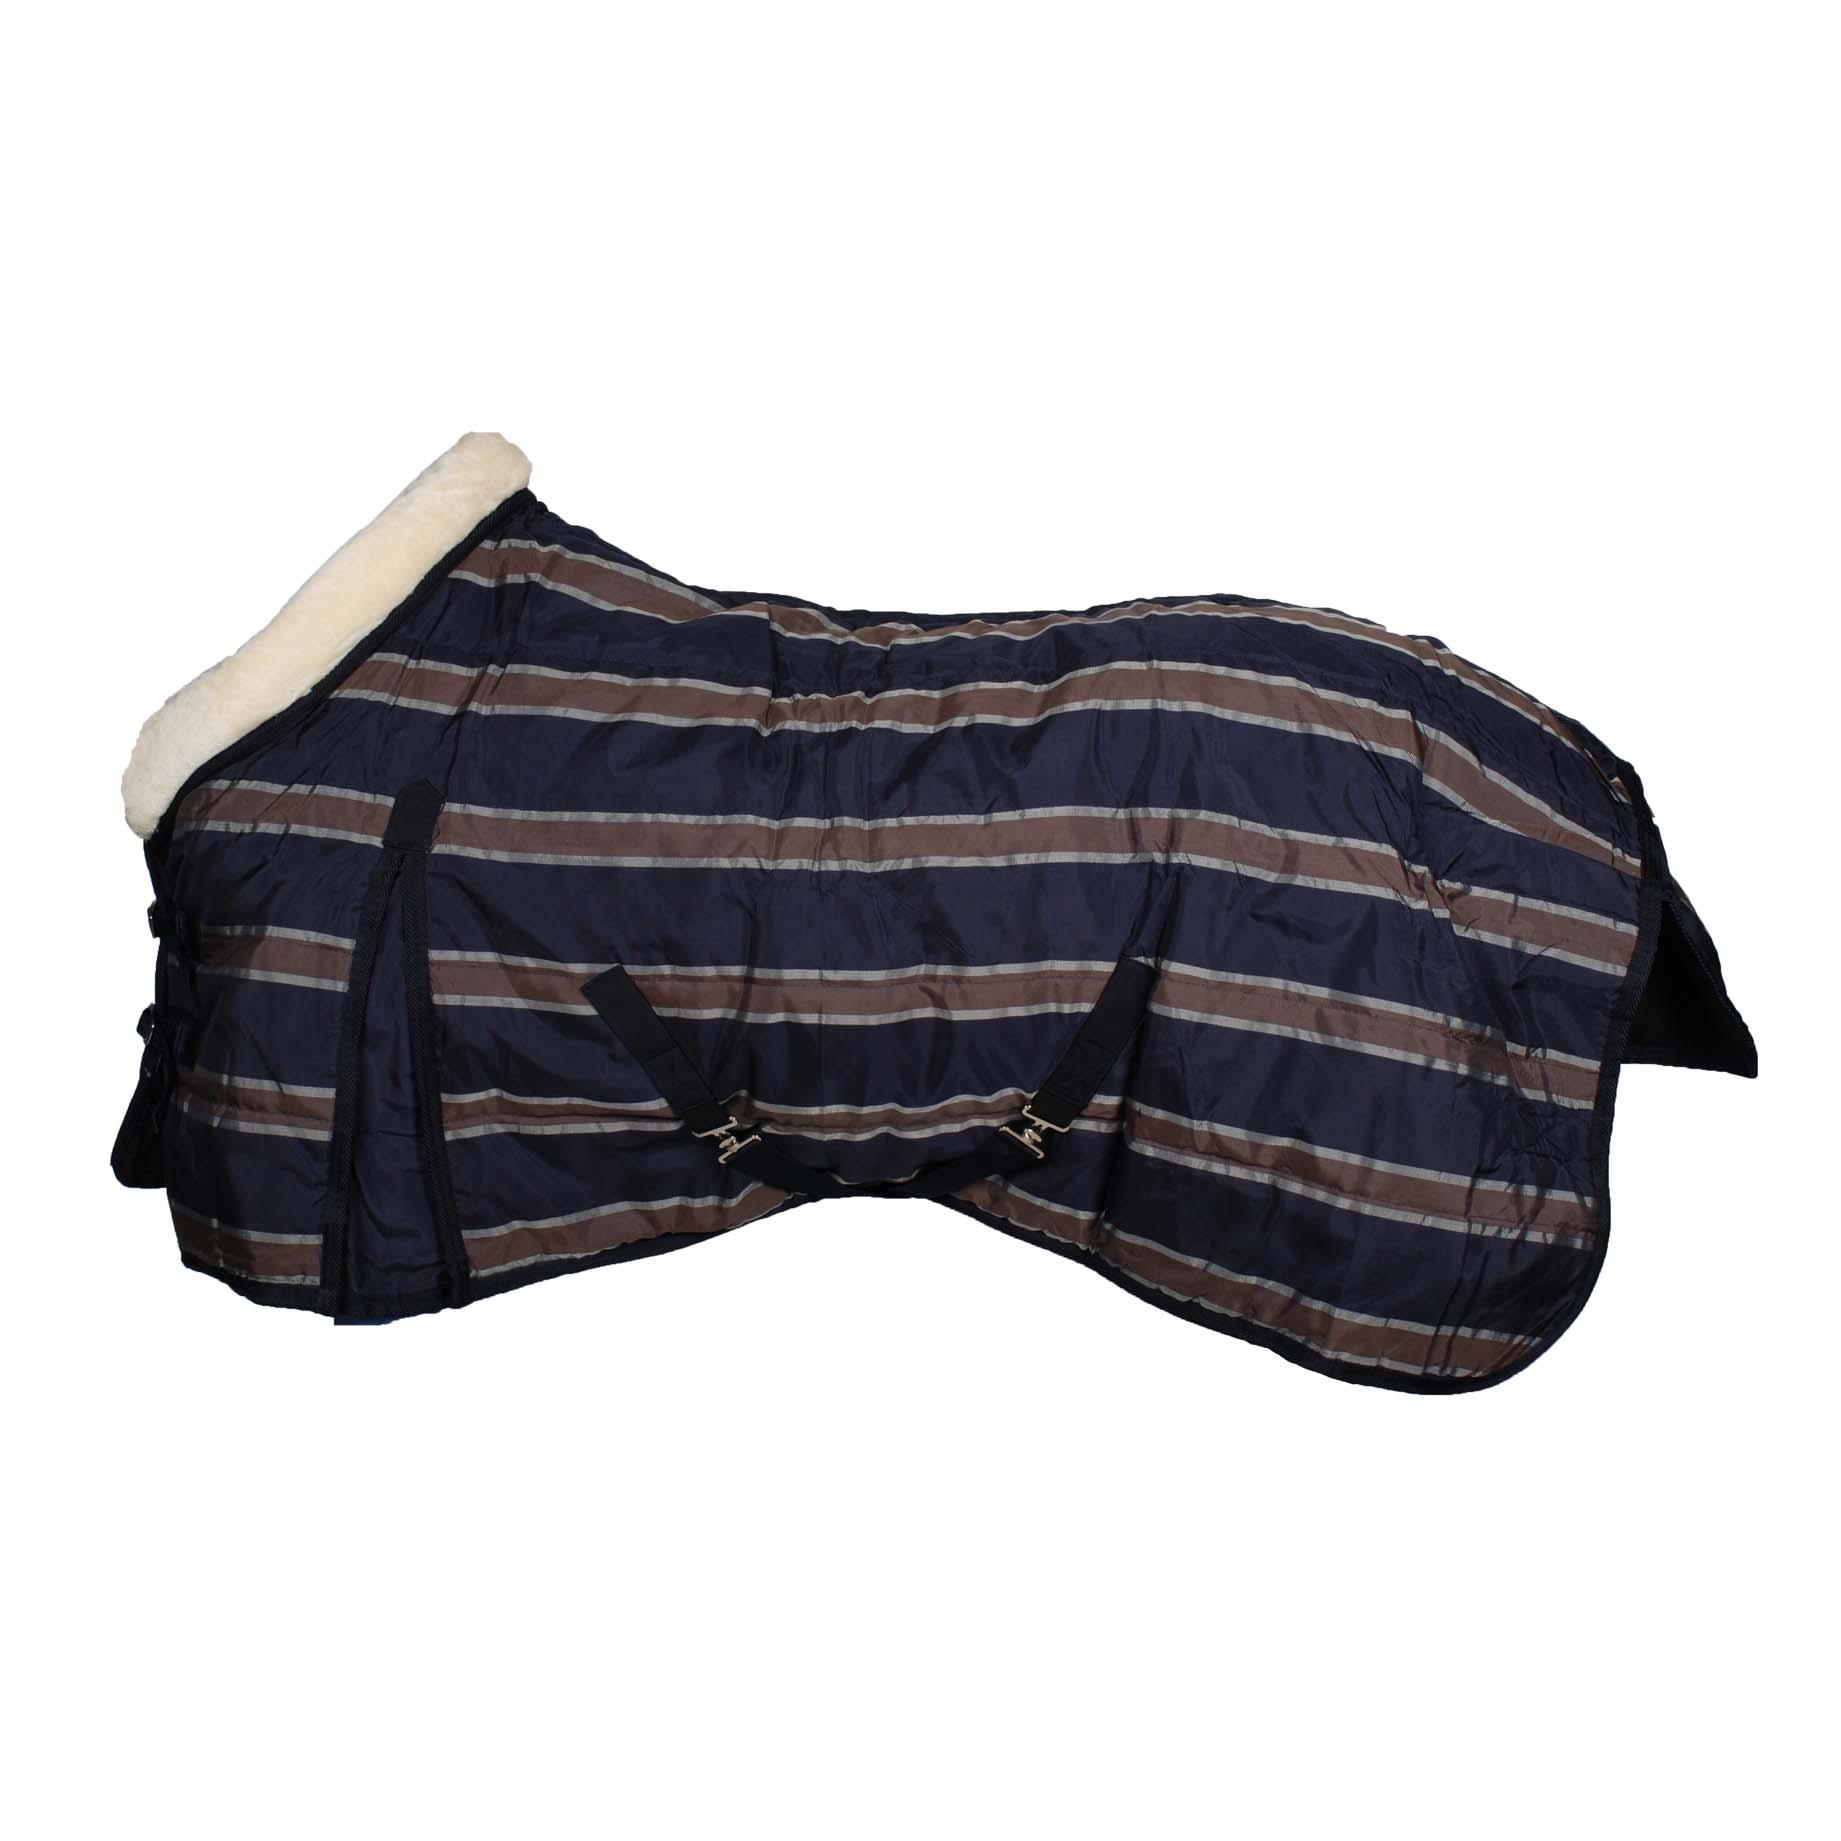 Pagony Stripe 220 staldeken donkerblauw maat:165